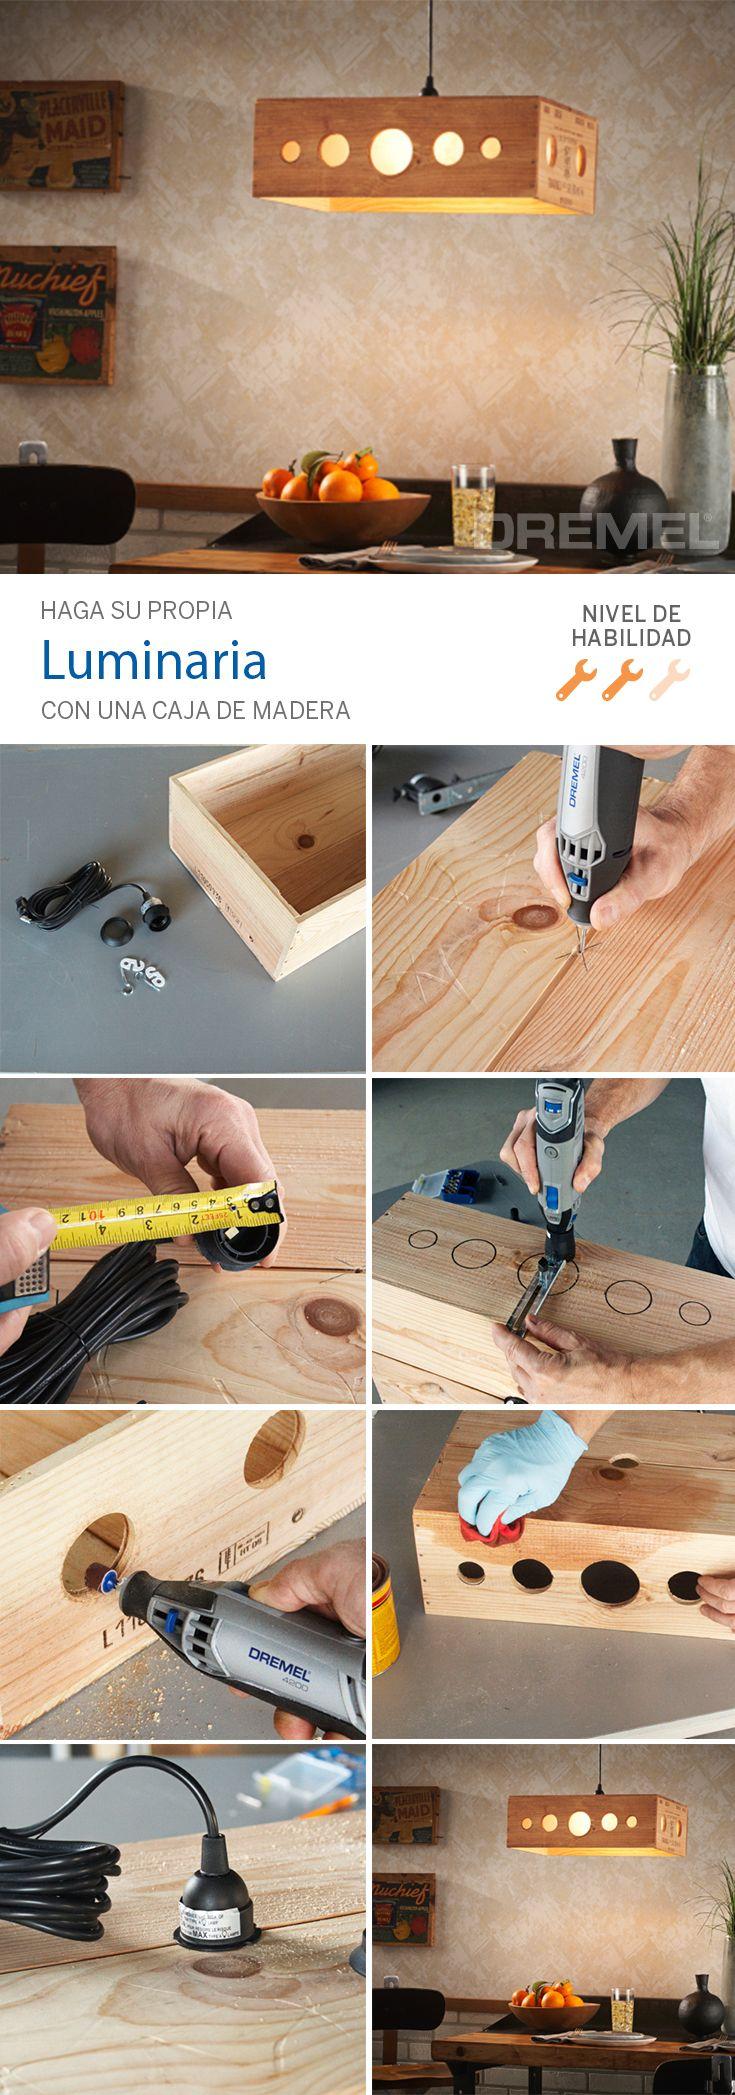 Haga su propria luminaria utilizando una caja de madera!